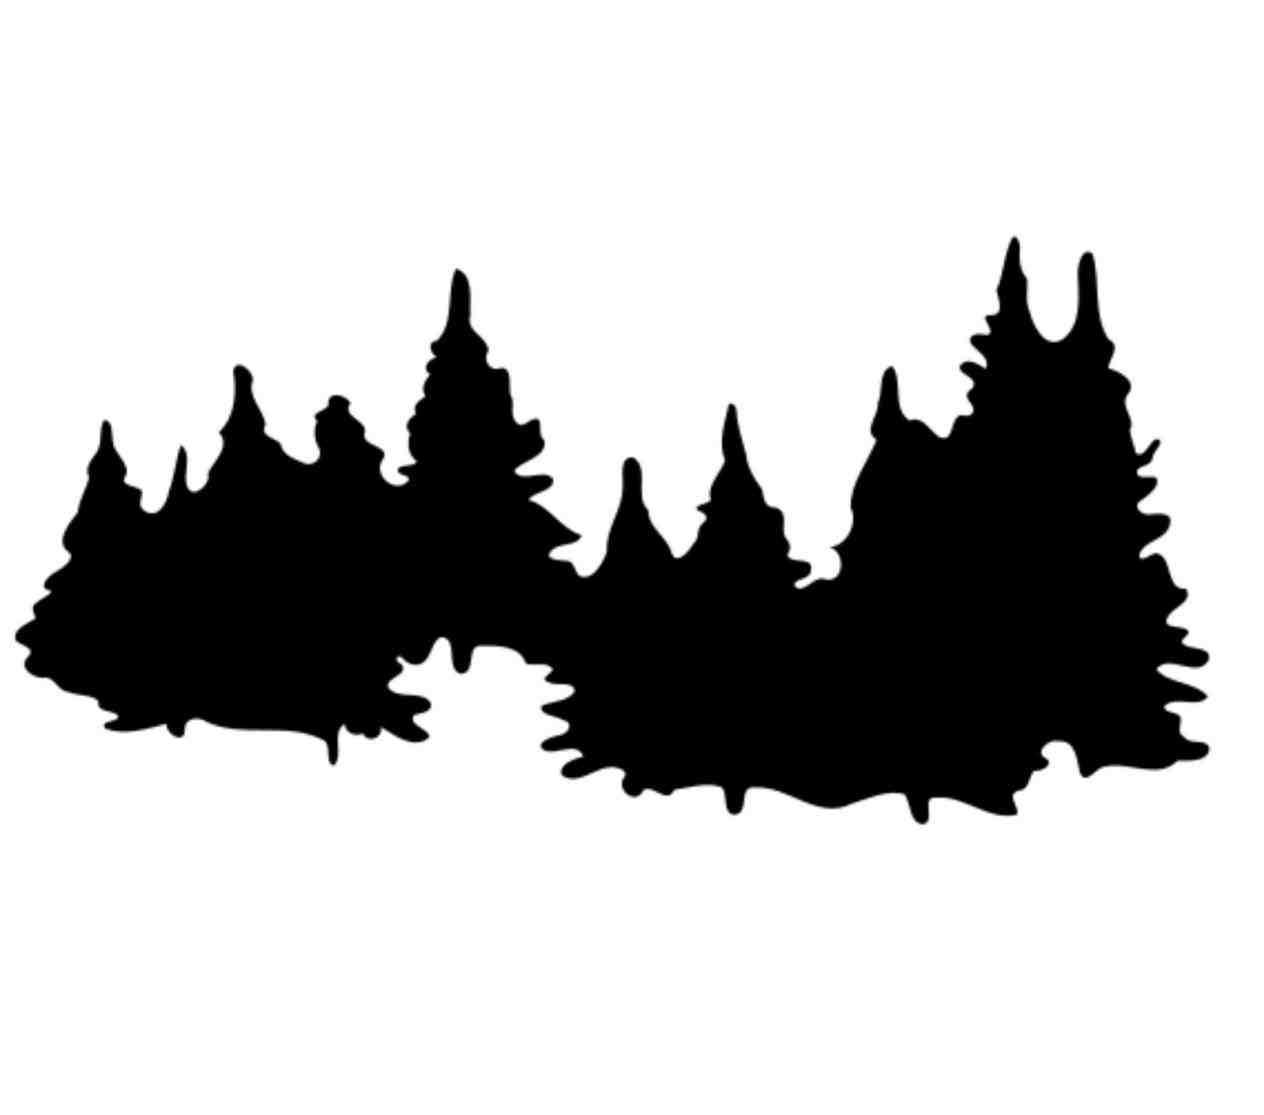 1264x1115 Silhouette Tree Oak Tree Silhouette Silhouettes Clip Art Vector